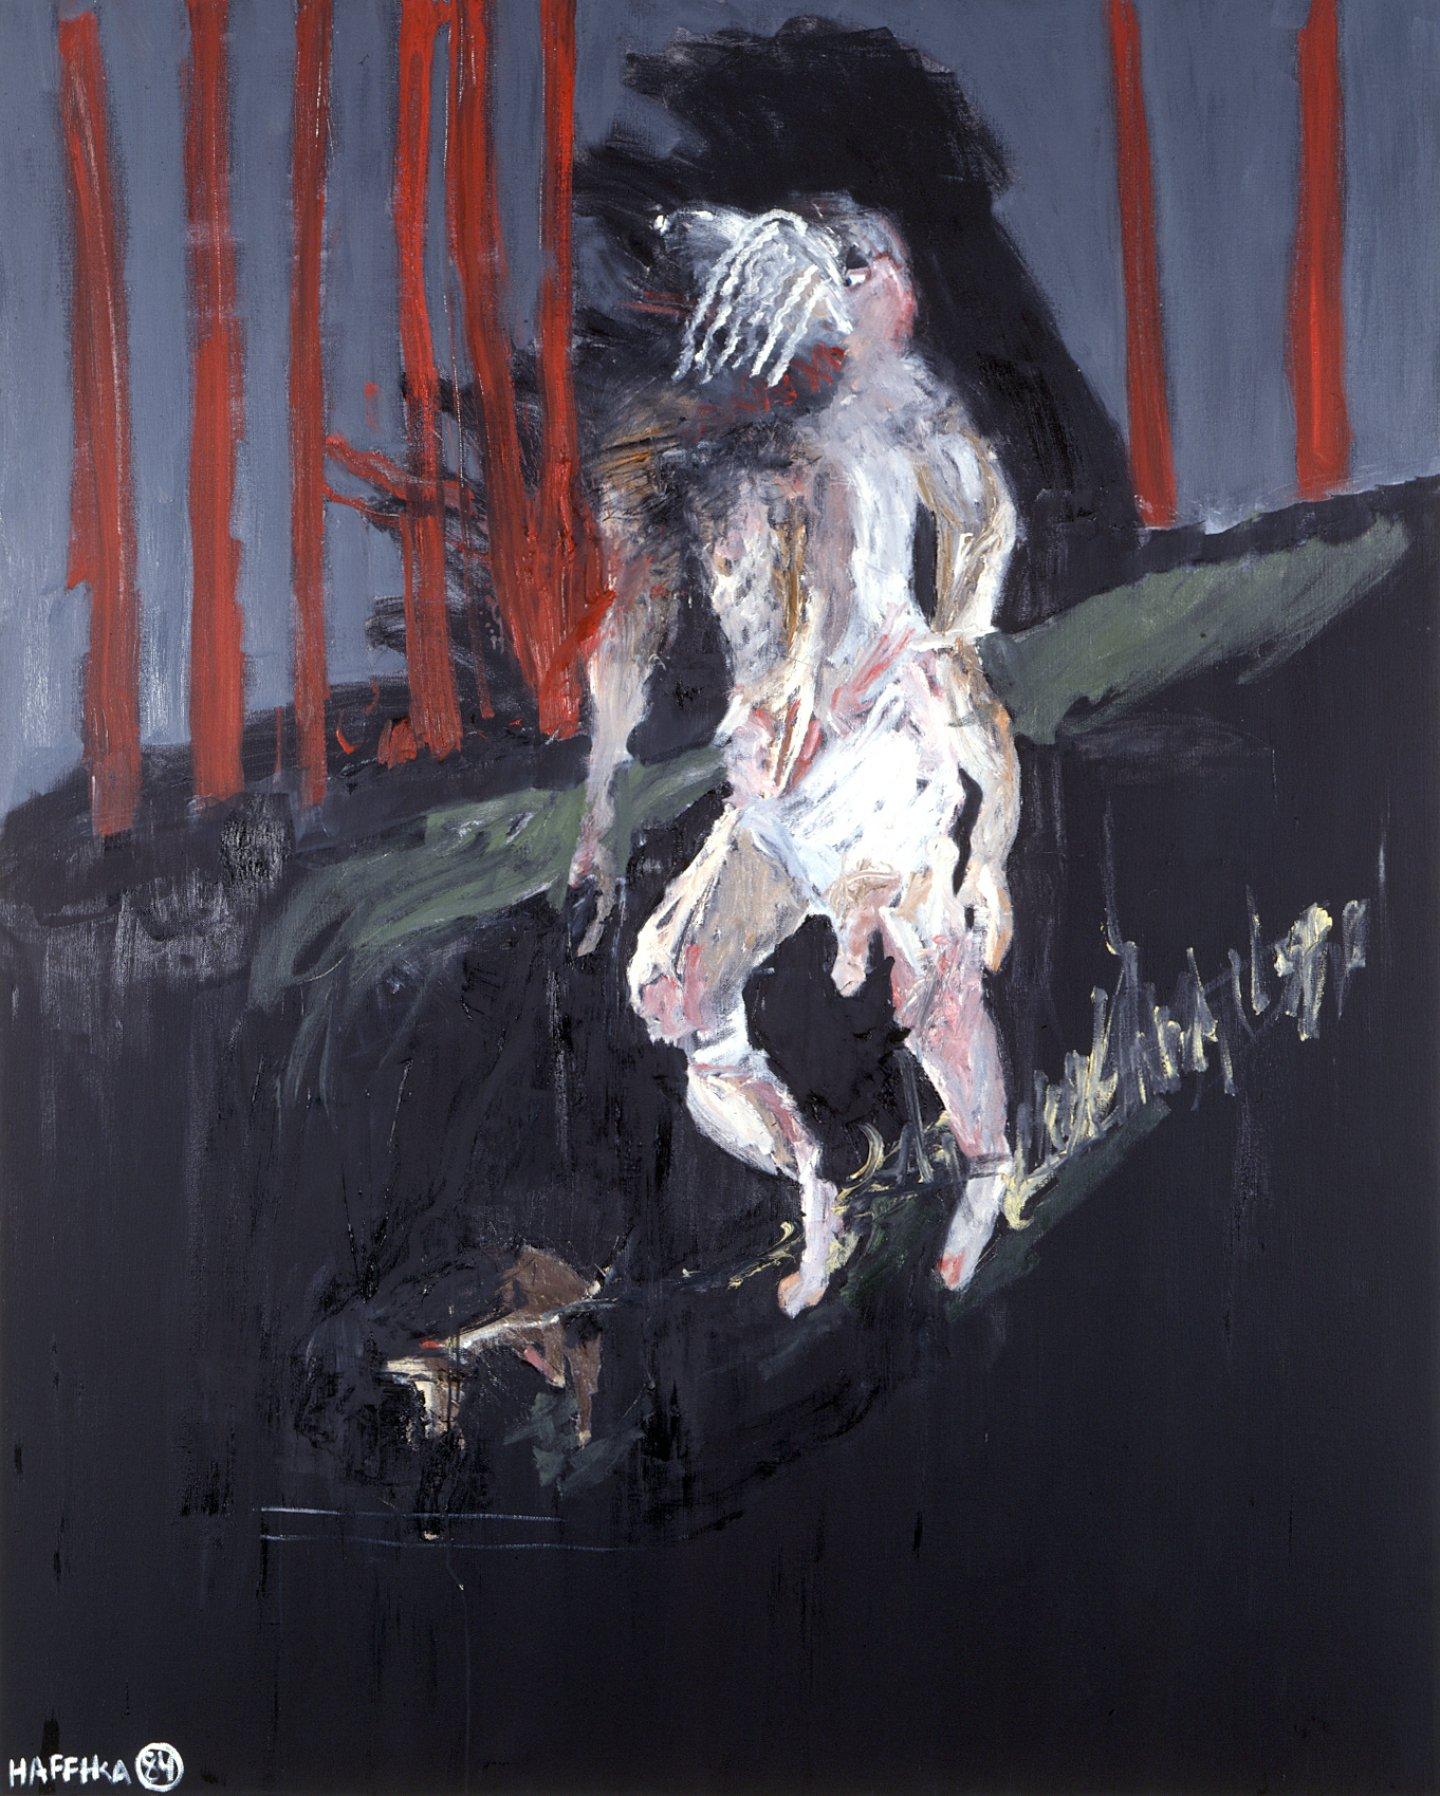 Michael Hafftka, Travel, Stephane Janssen Collection